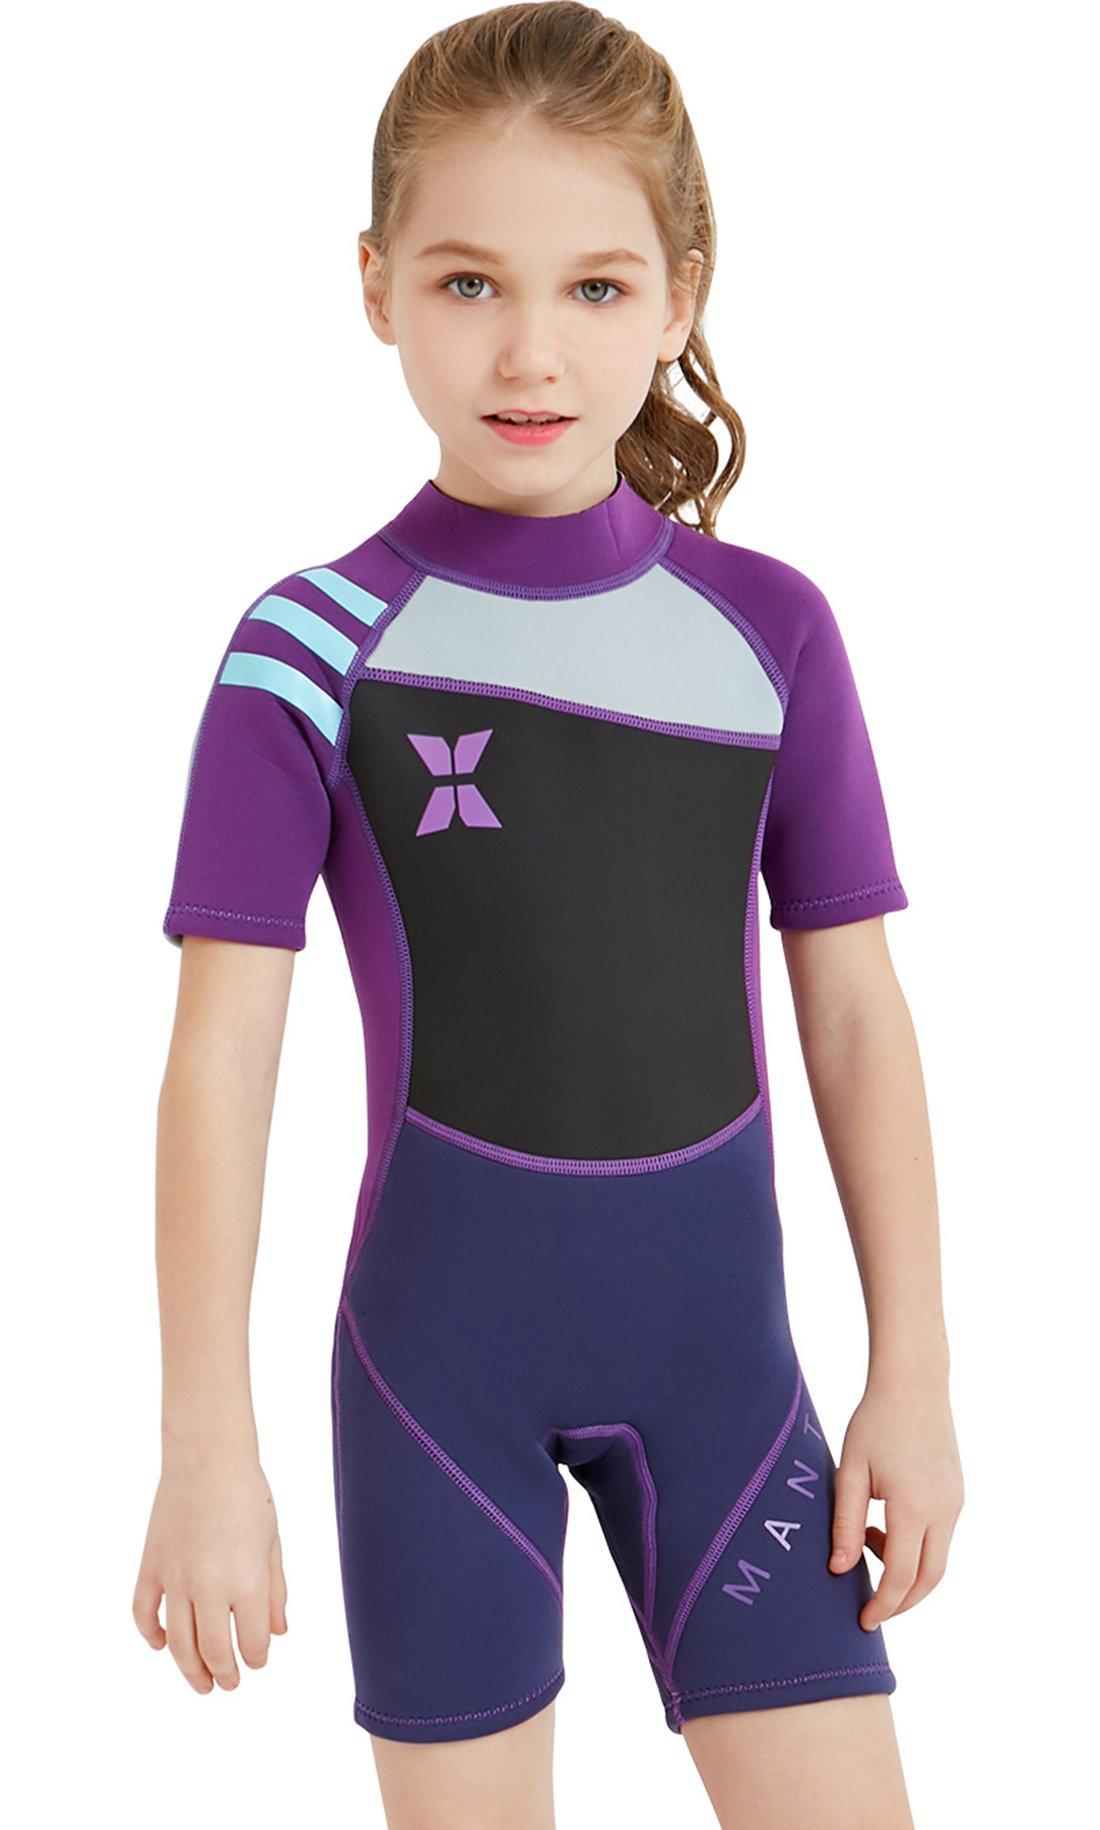 DIVE & SAIL Kids Wetsuit 2.5MM Full Suit Warm One Piece Short Sleeve Swimsuit Shorty Suit Thermal Diving Suit Swimwear Purple XL by DIVE & SAIL